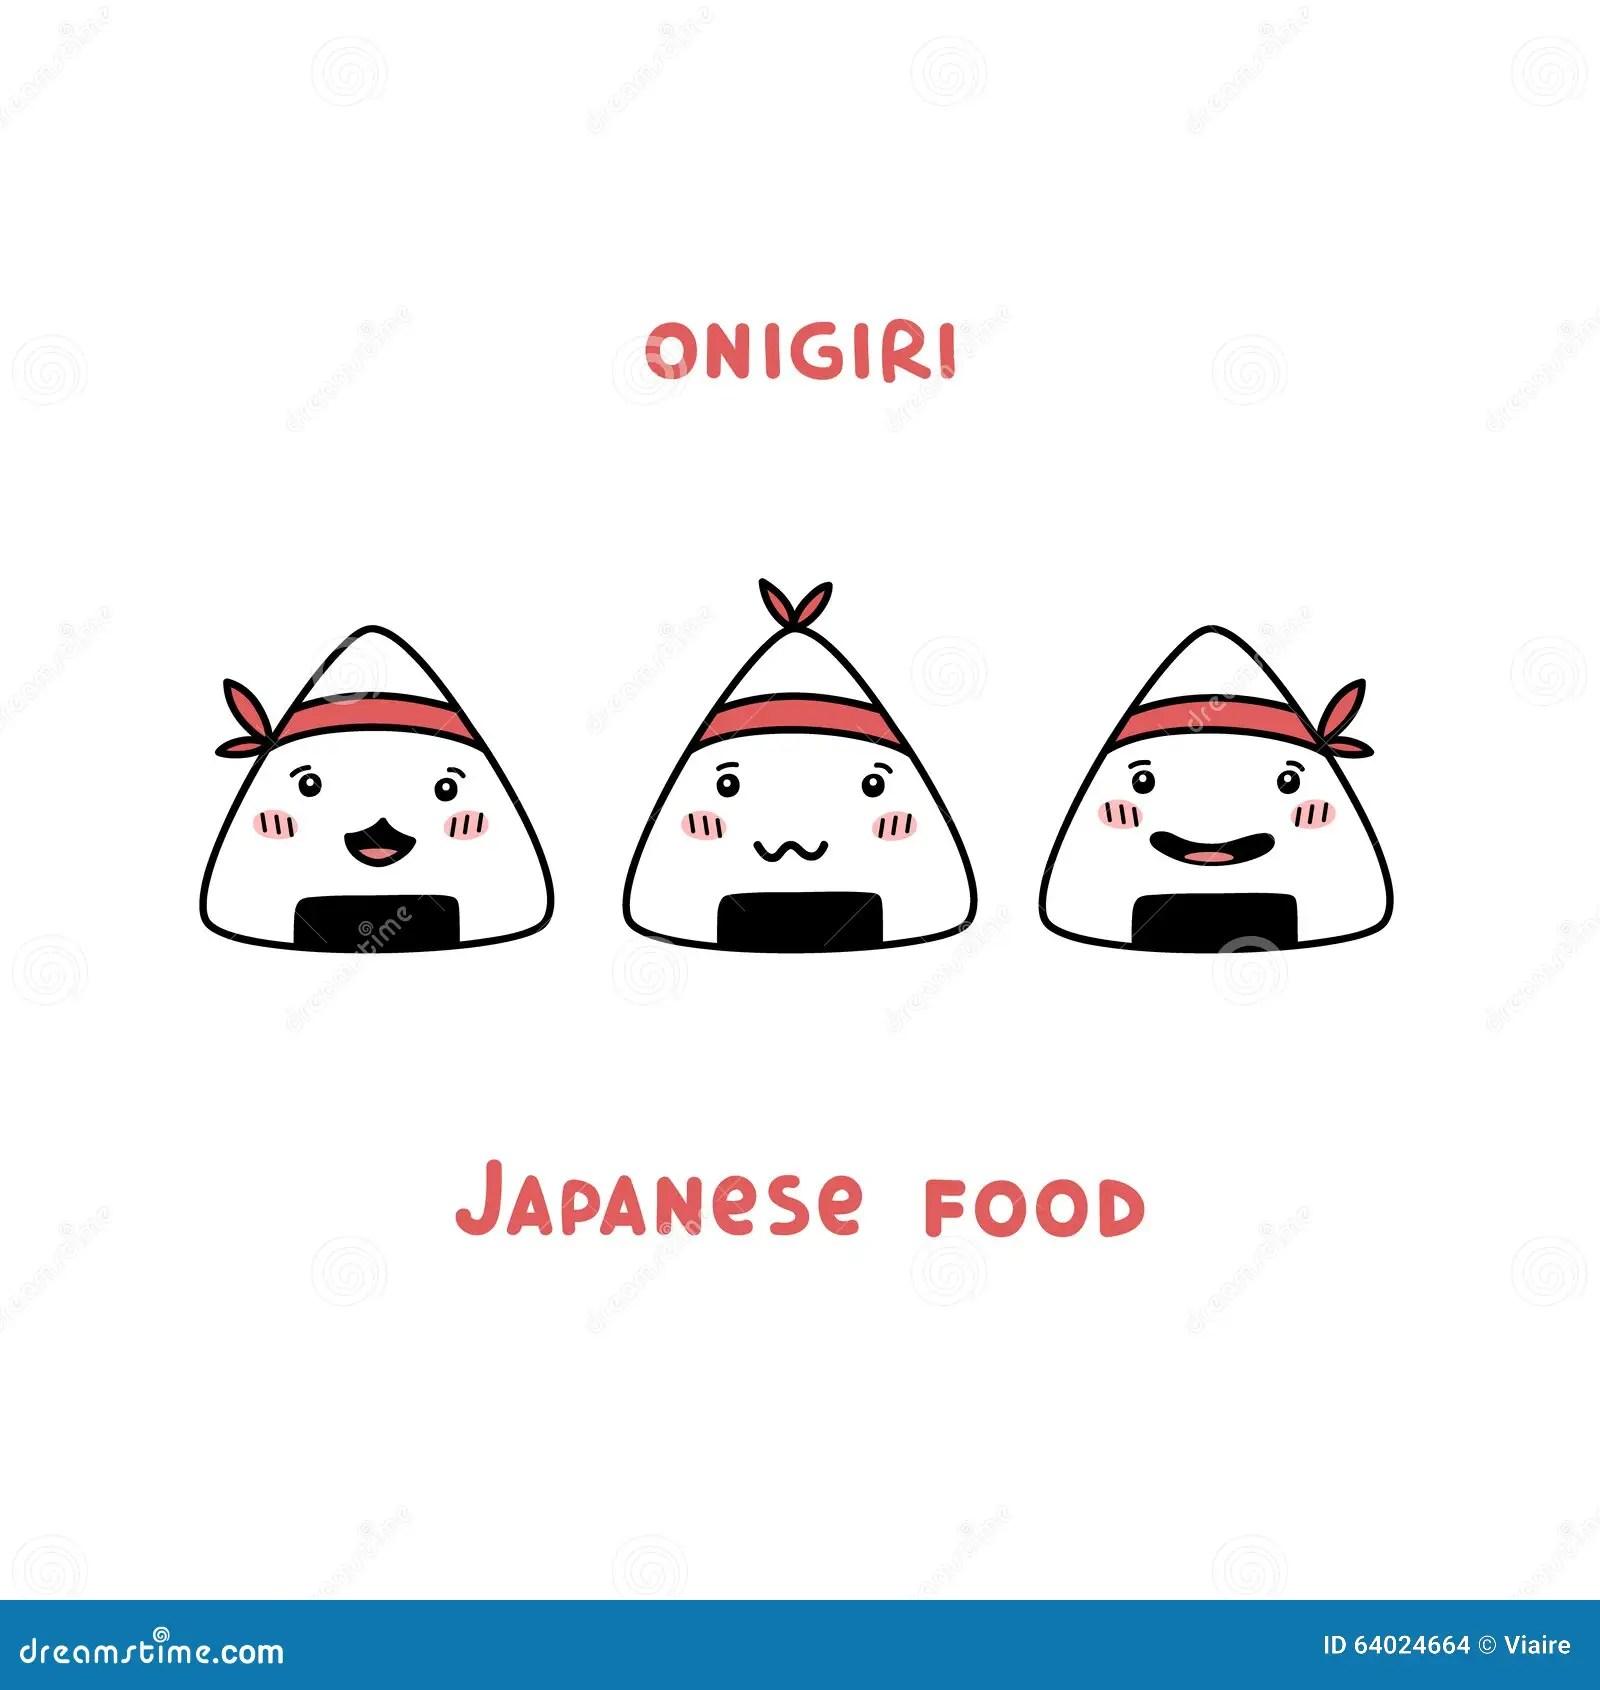 Japanese Food Onigiri Cartoon With Different Smiles Stock